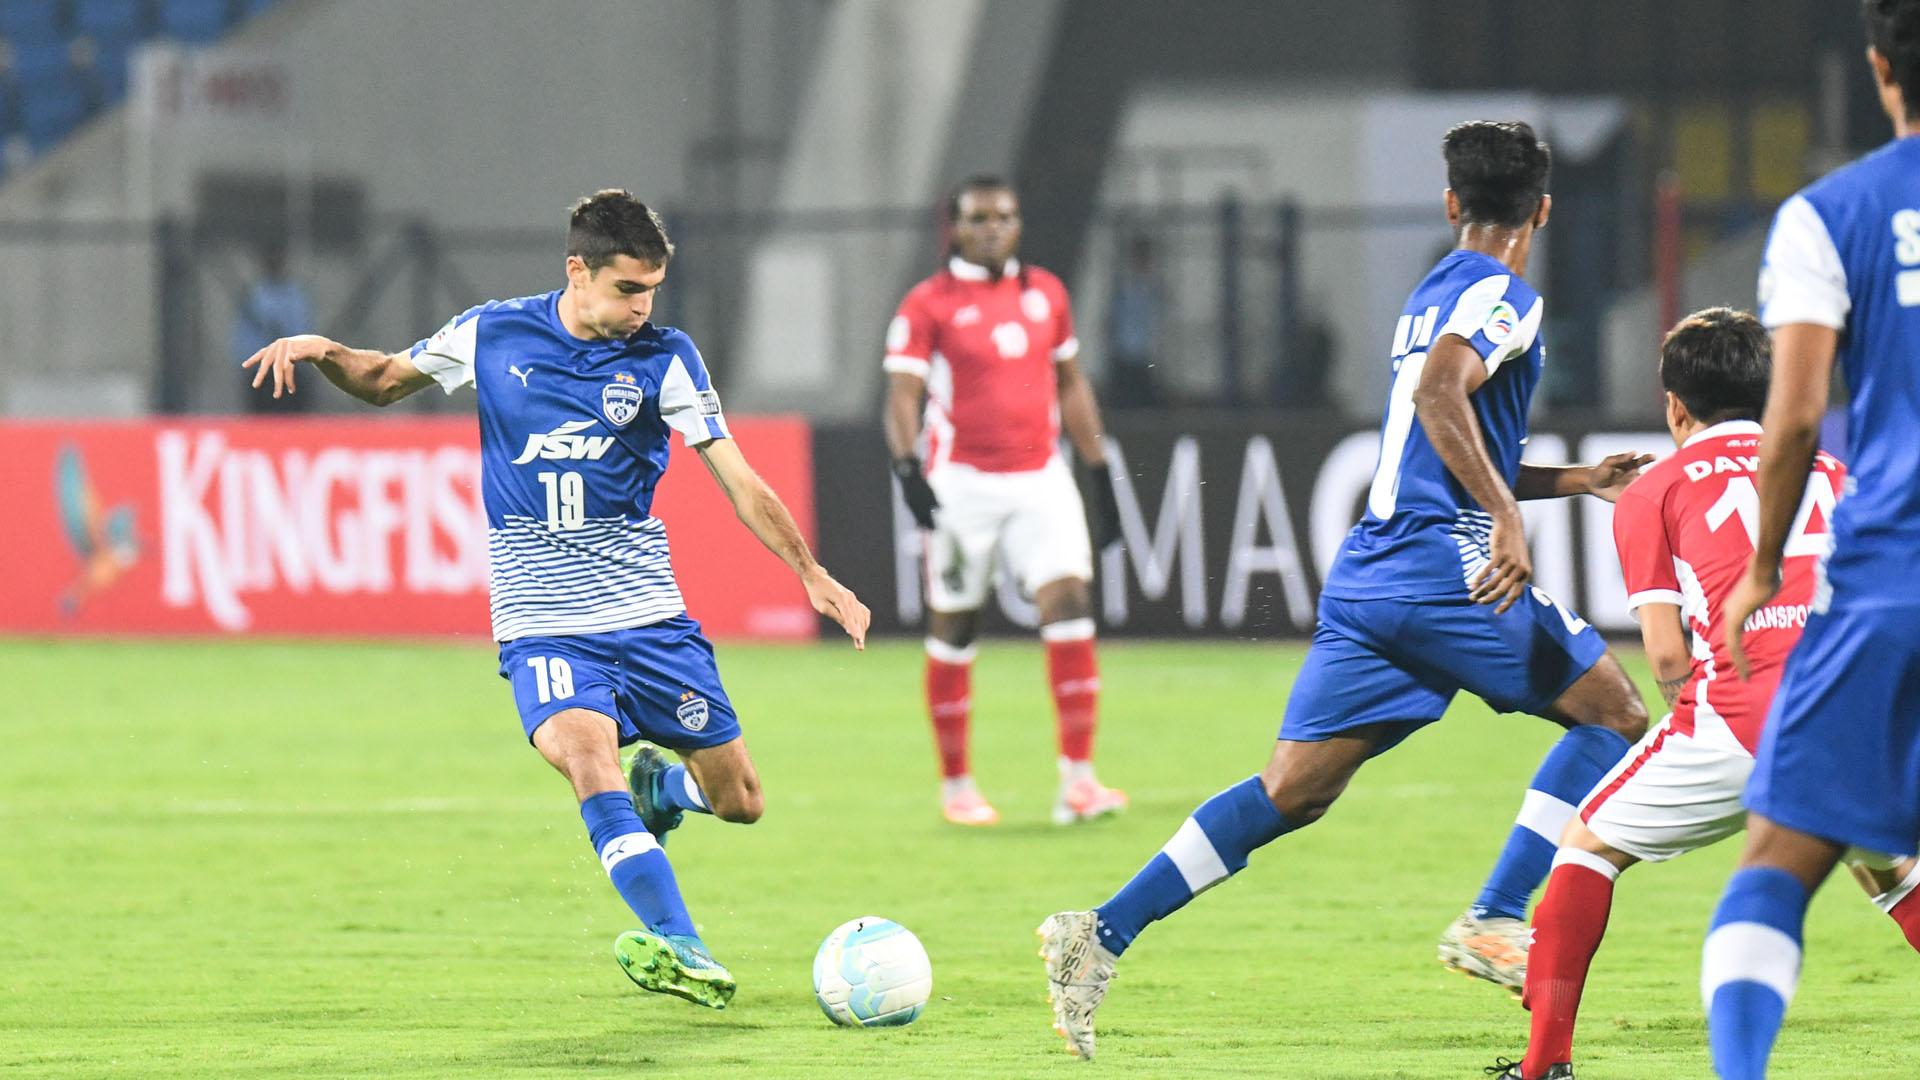 Toni Dovale Bengaluru FC Transport United AFC Cup Preliminary Round 2018